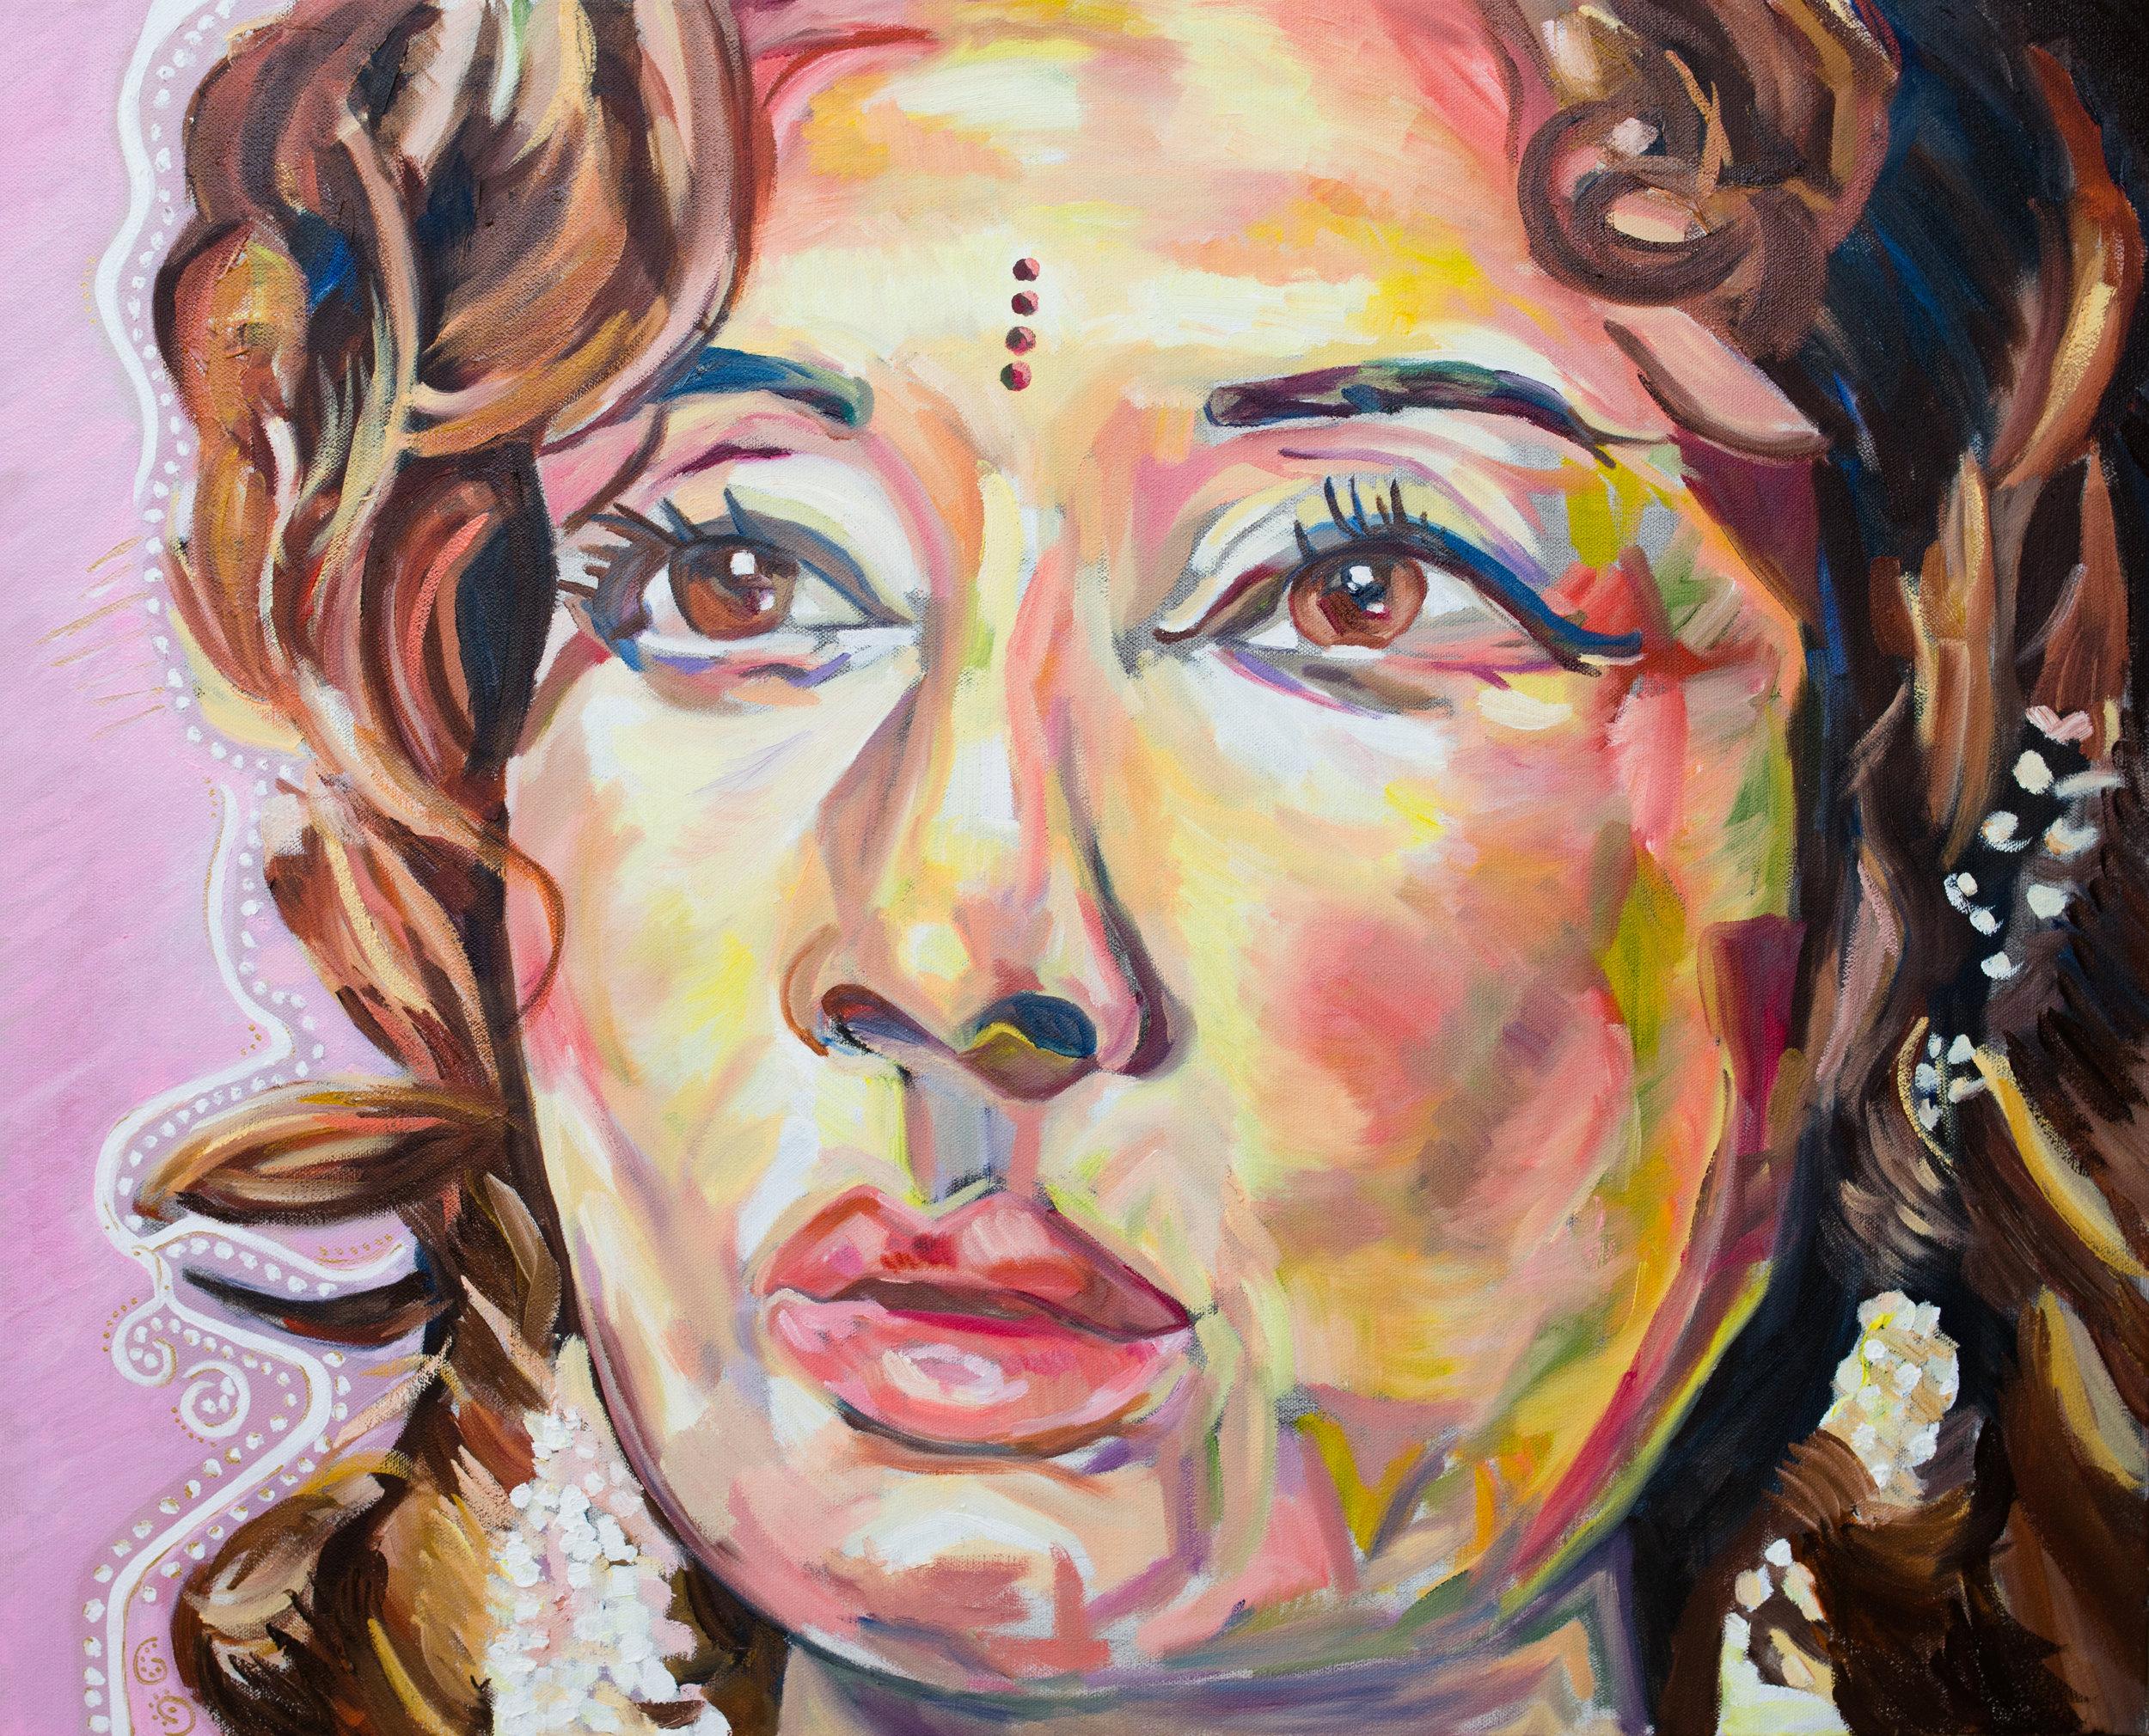 "My Rasa Surprised | Oil on canvas | 24 x 30"" | 2016"